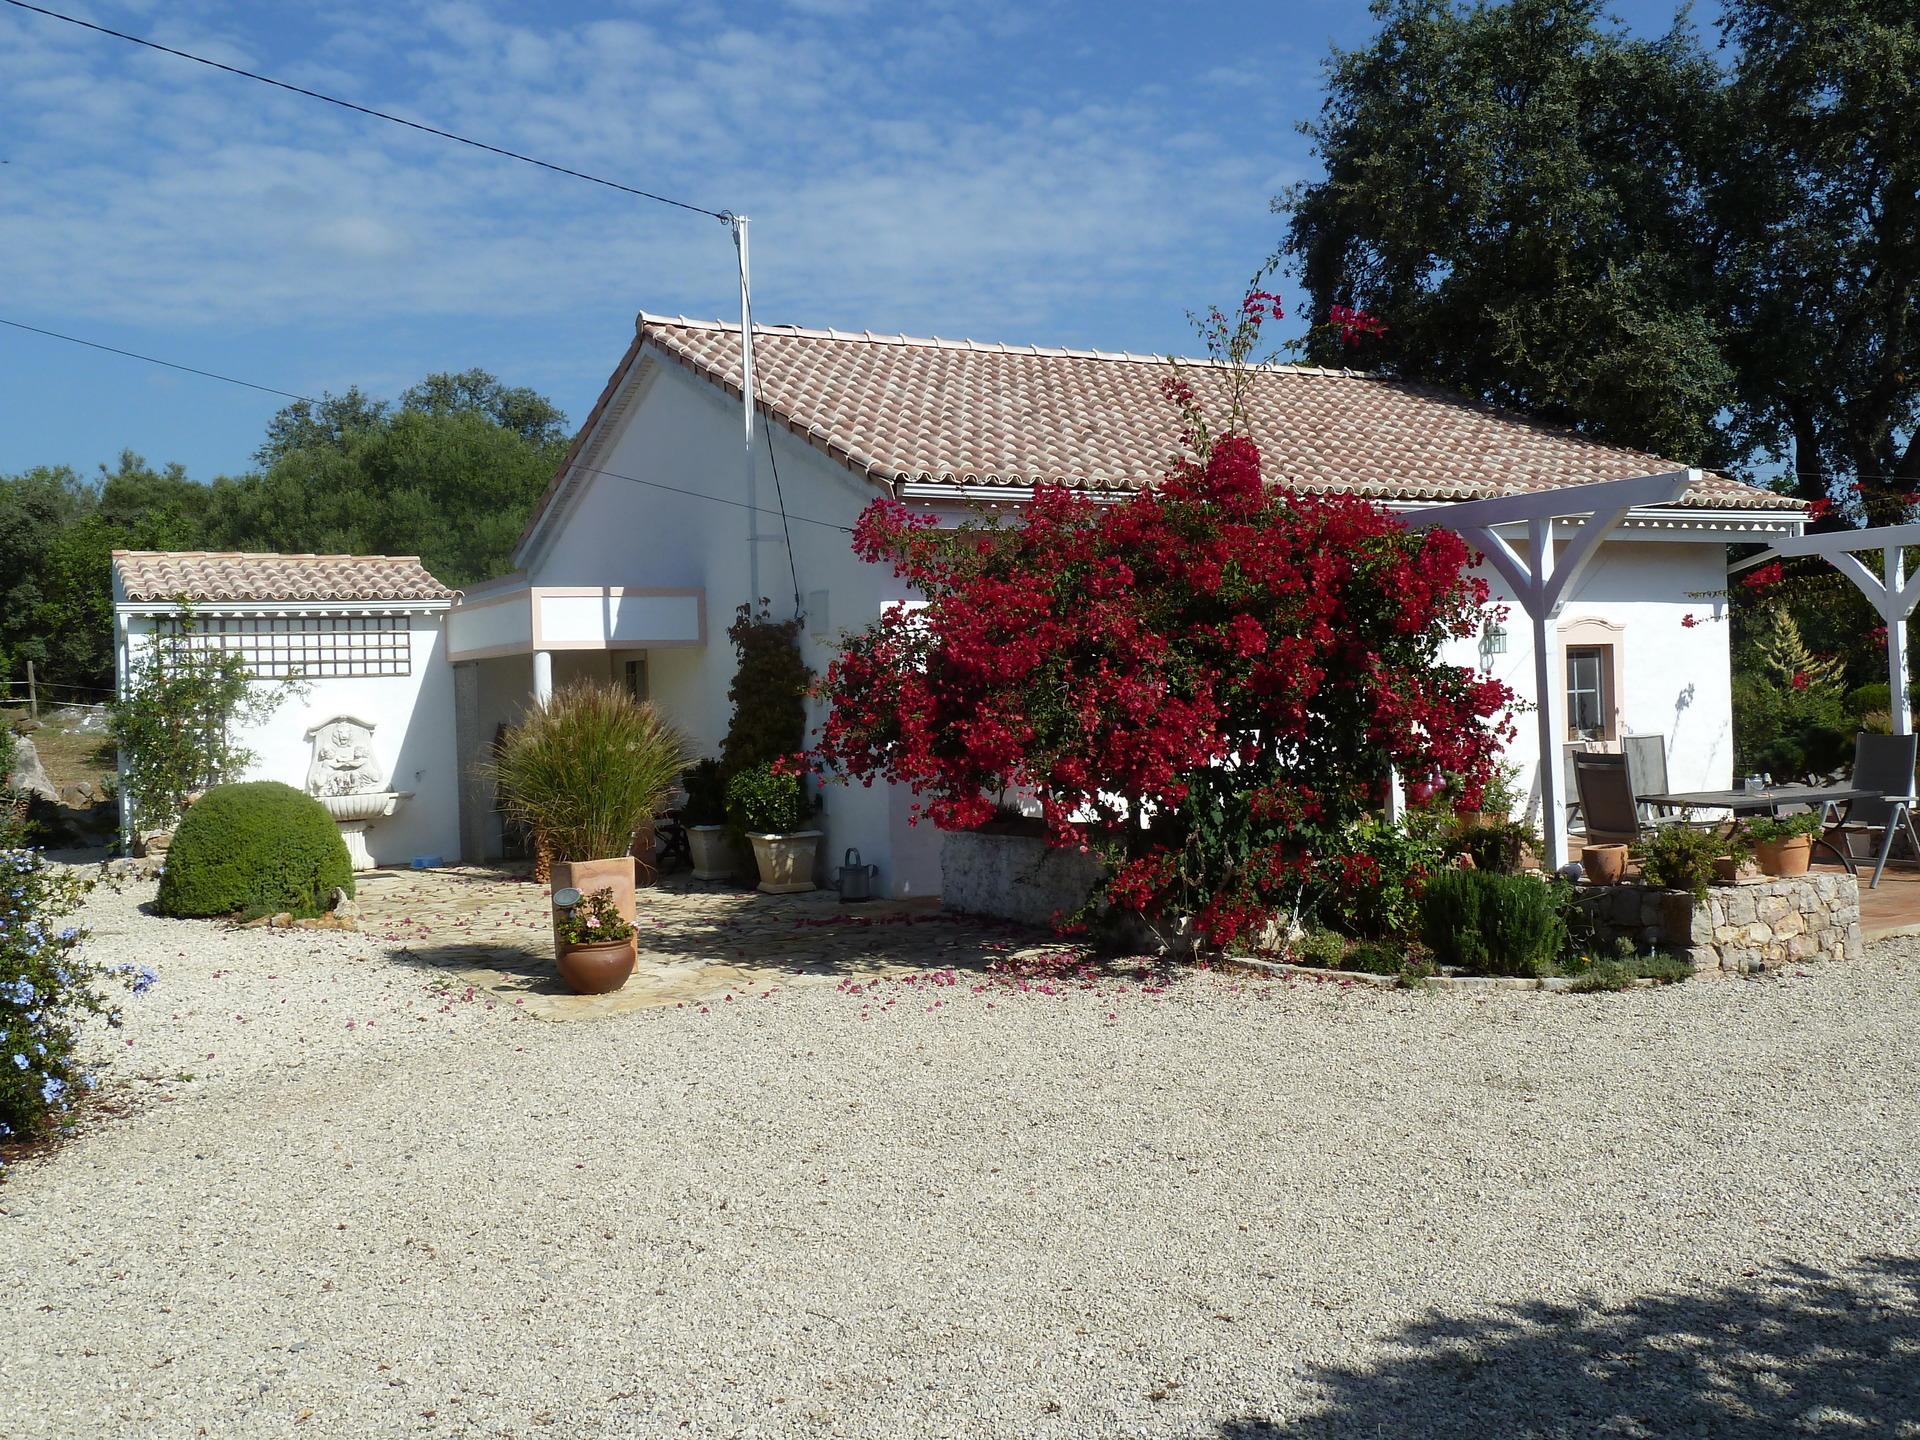 4 Bedroom House Sao Bras de Alportel, Central Algarve Ref: JV10329